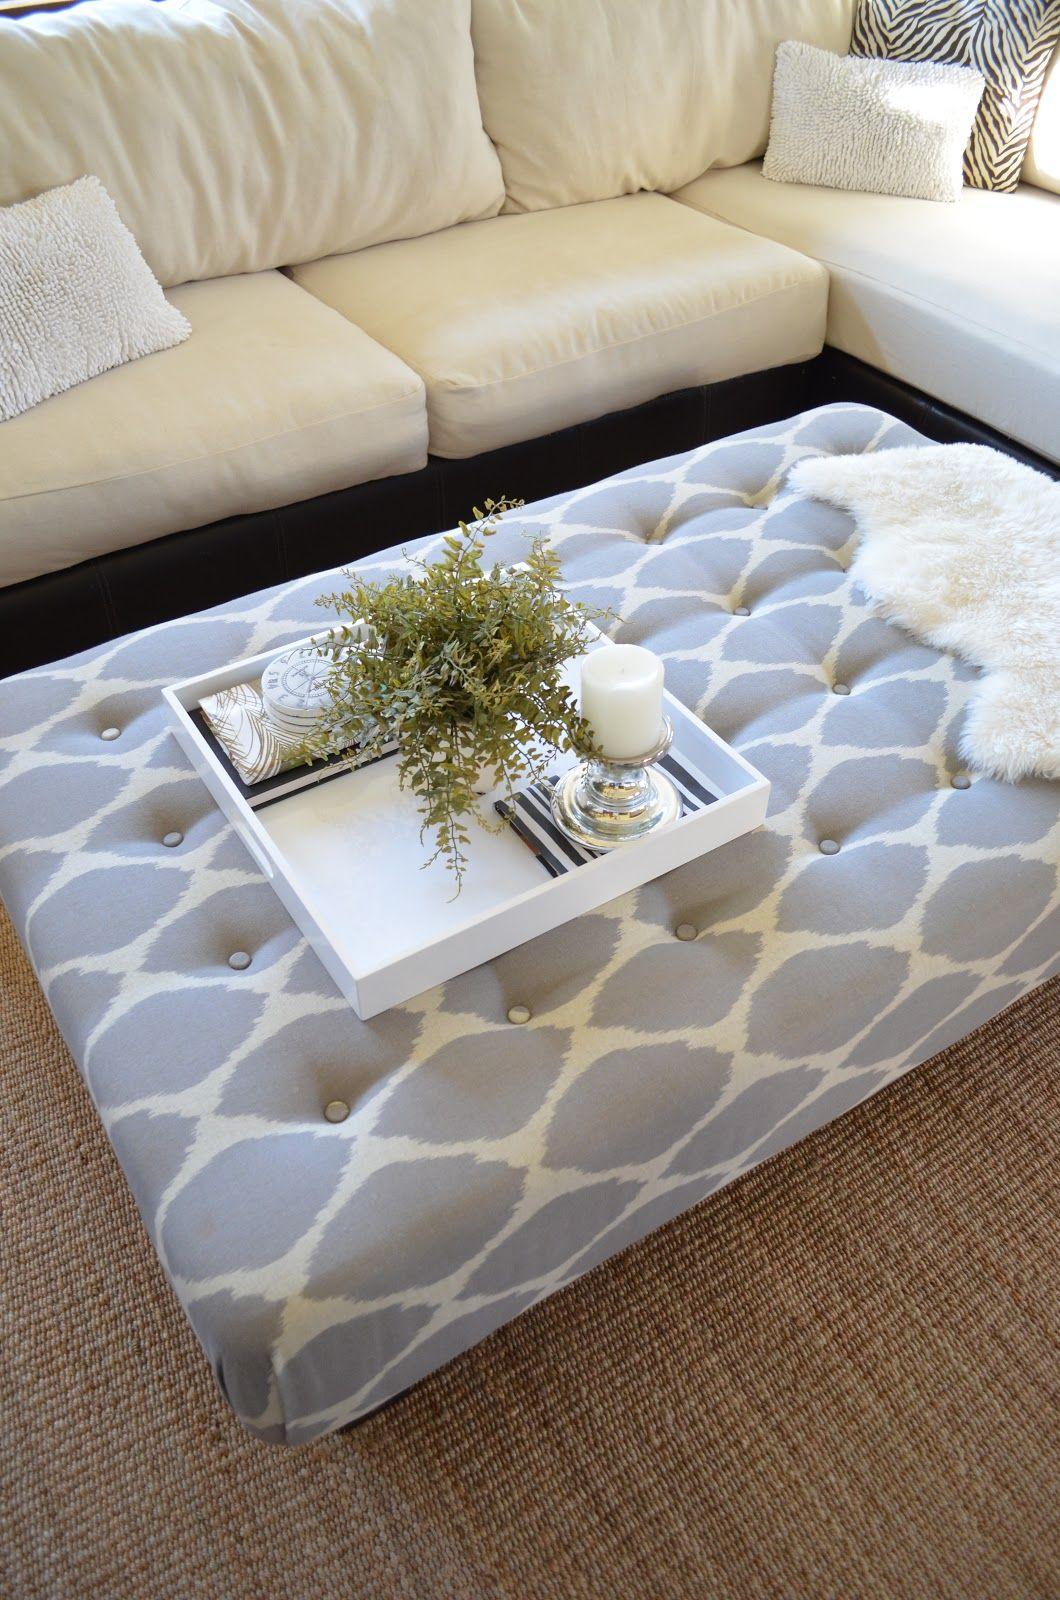 Turn A Coffee Table Into An Ottoman Diy Couch Diy